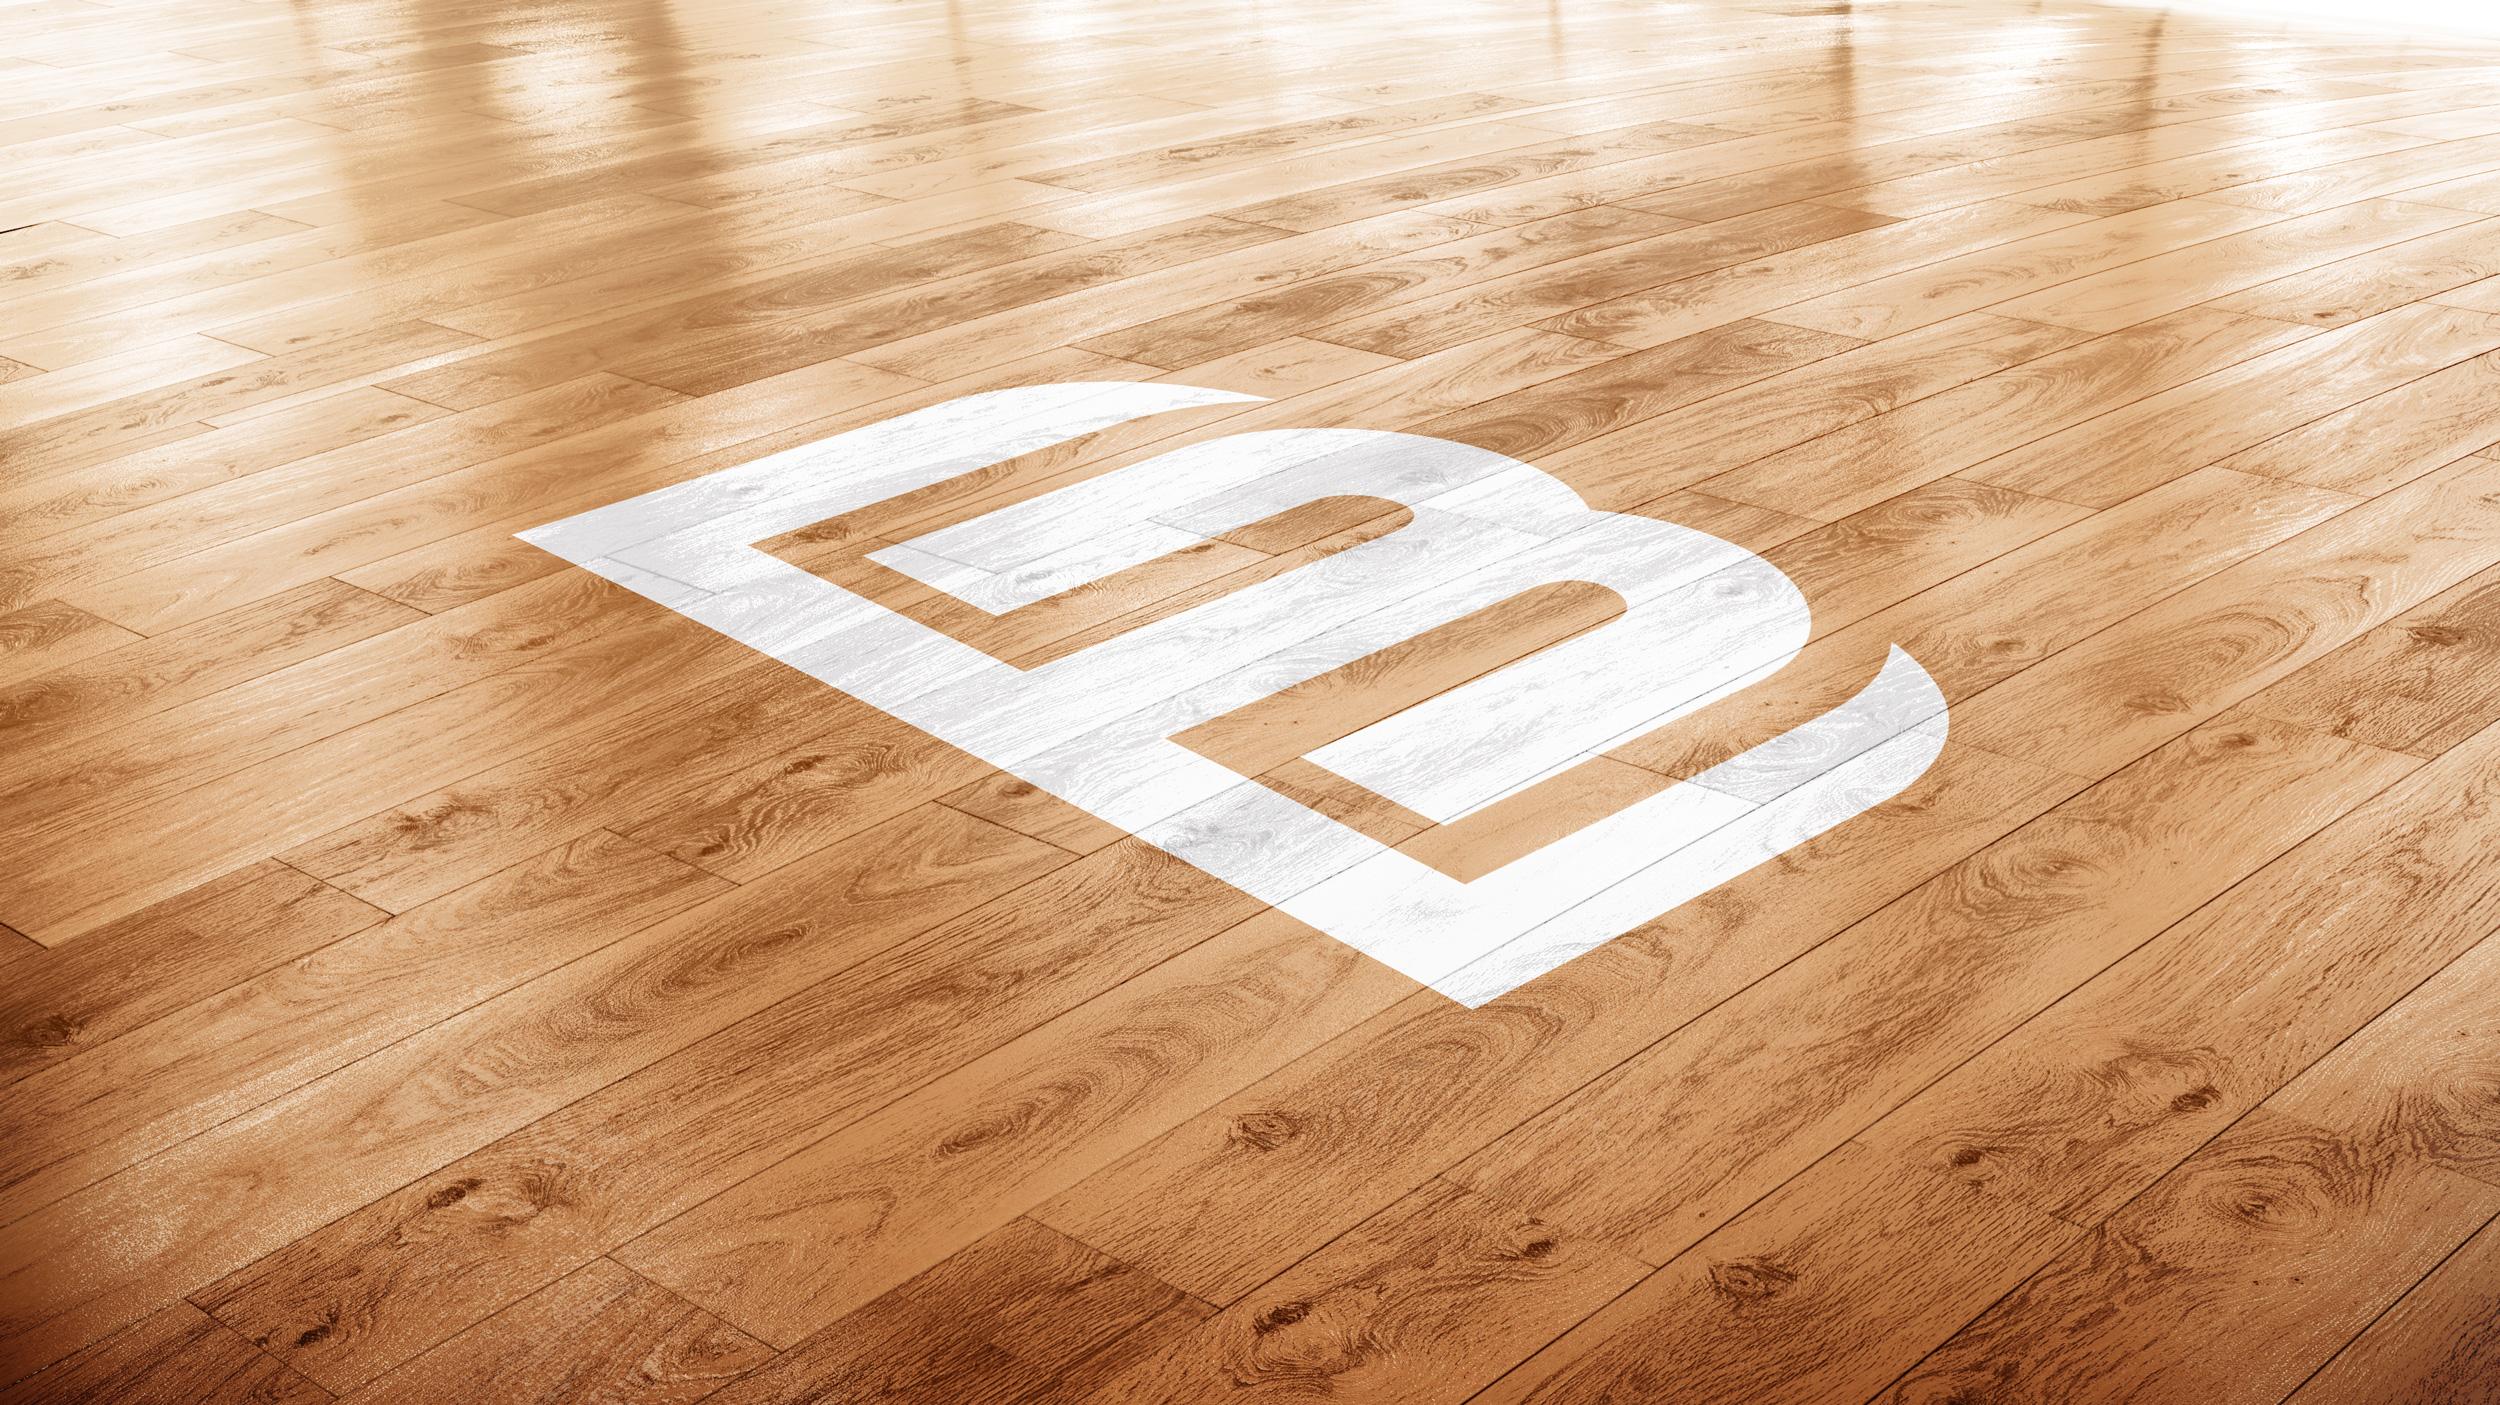 Big-Baller-Brand_Court-3.jpg